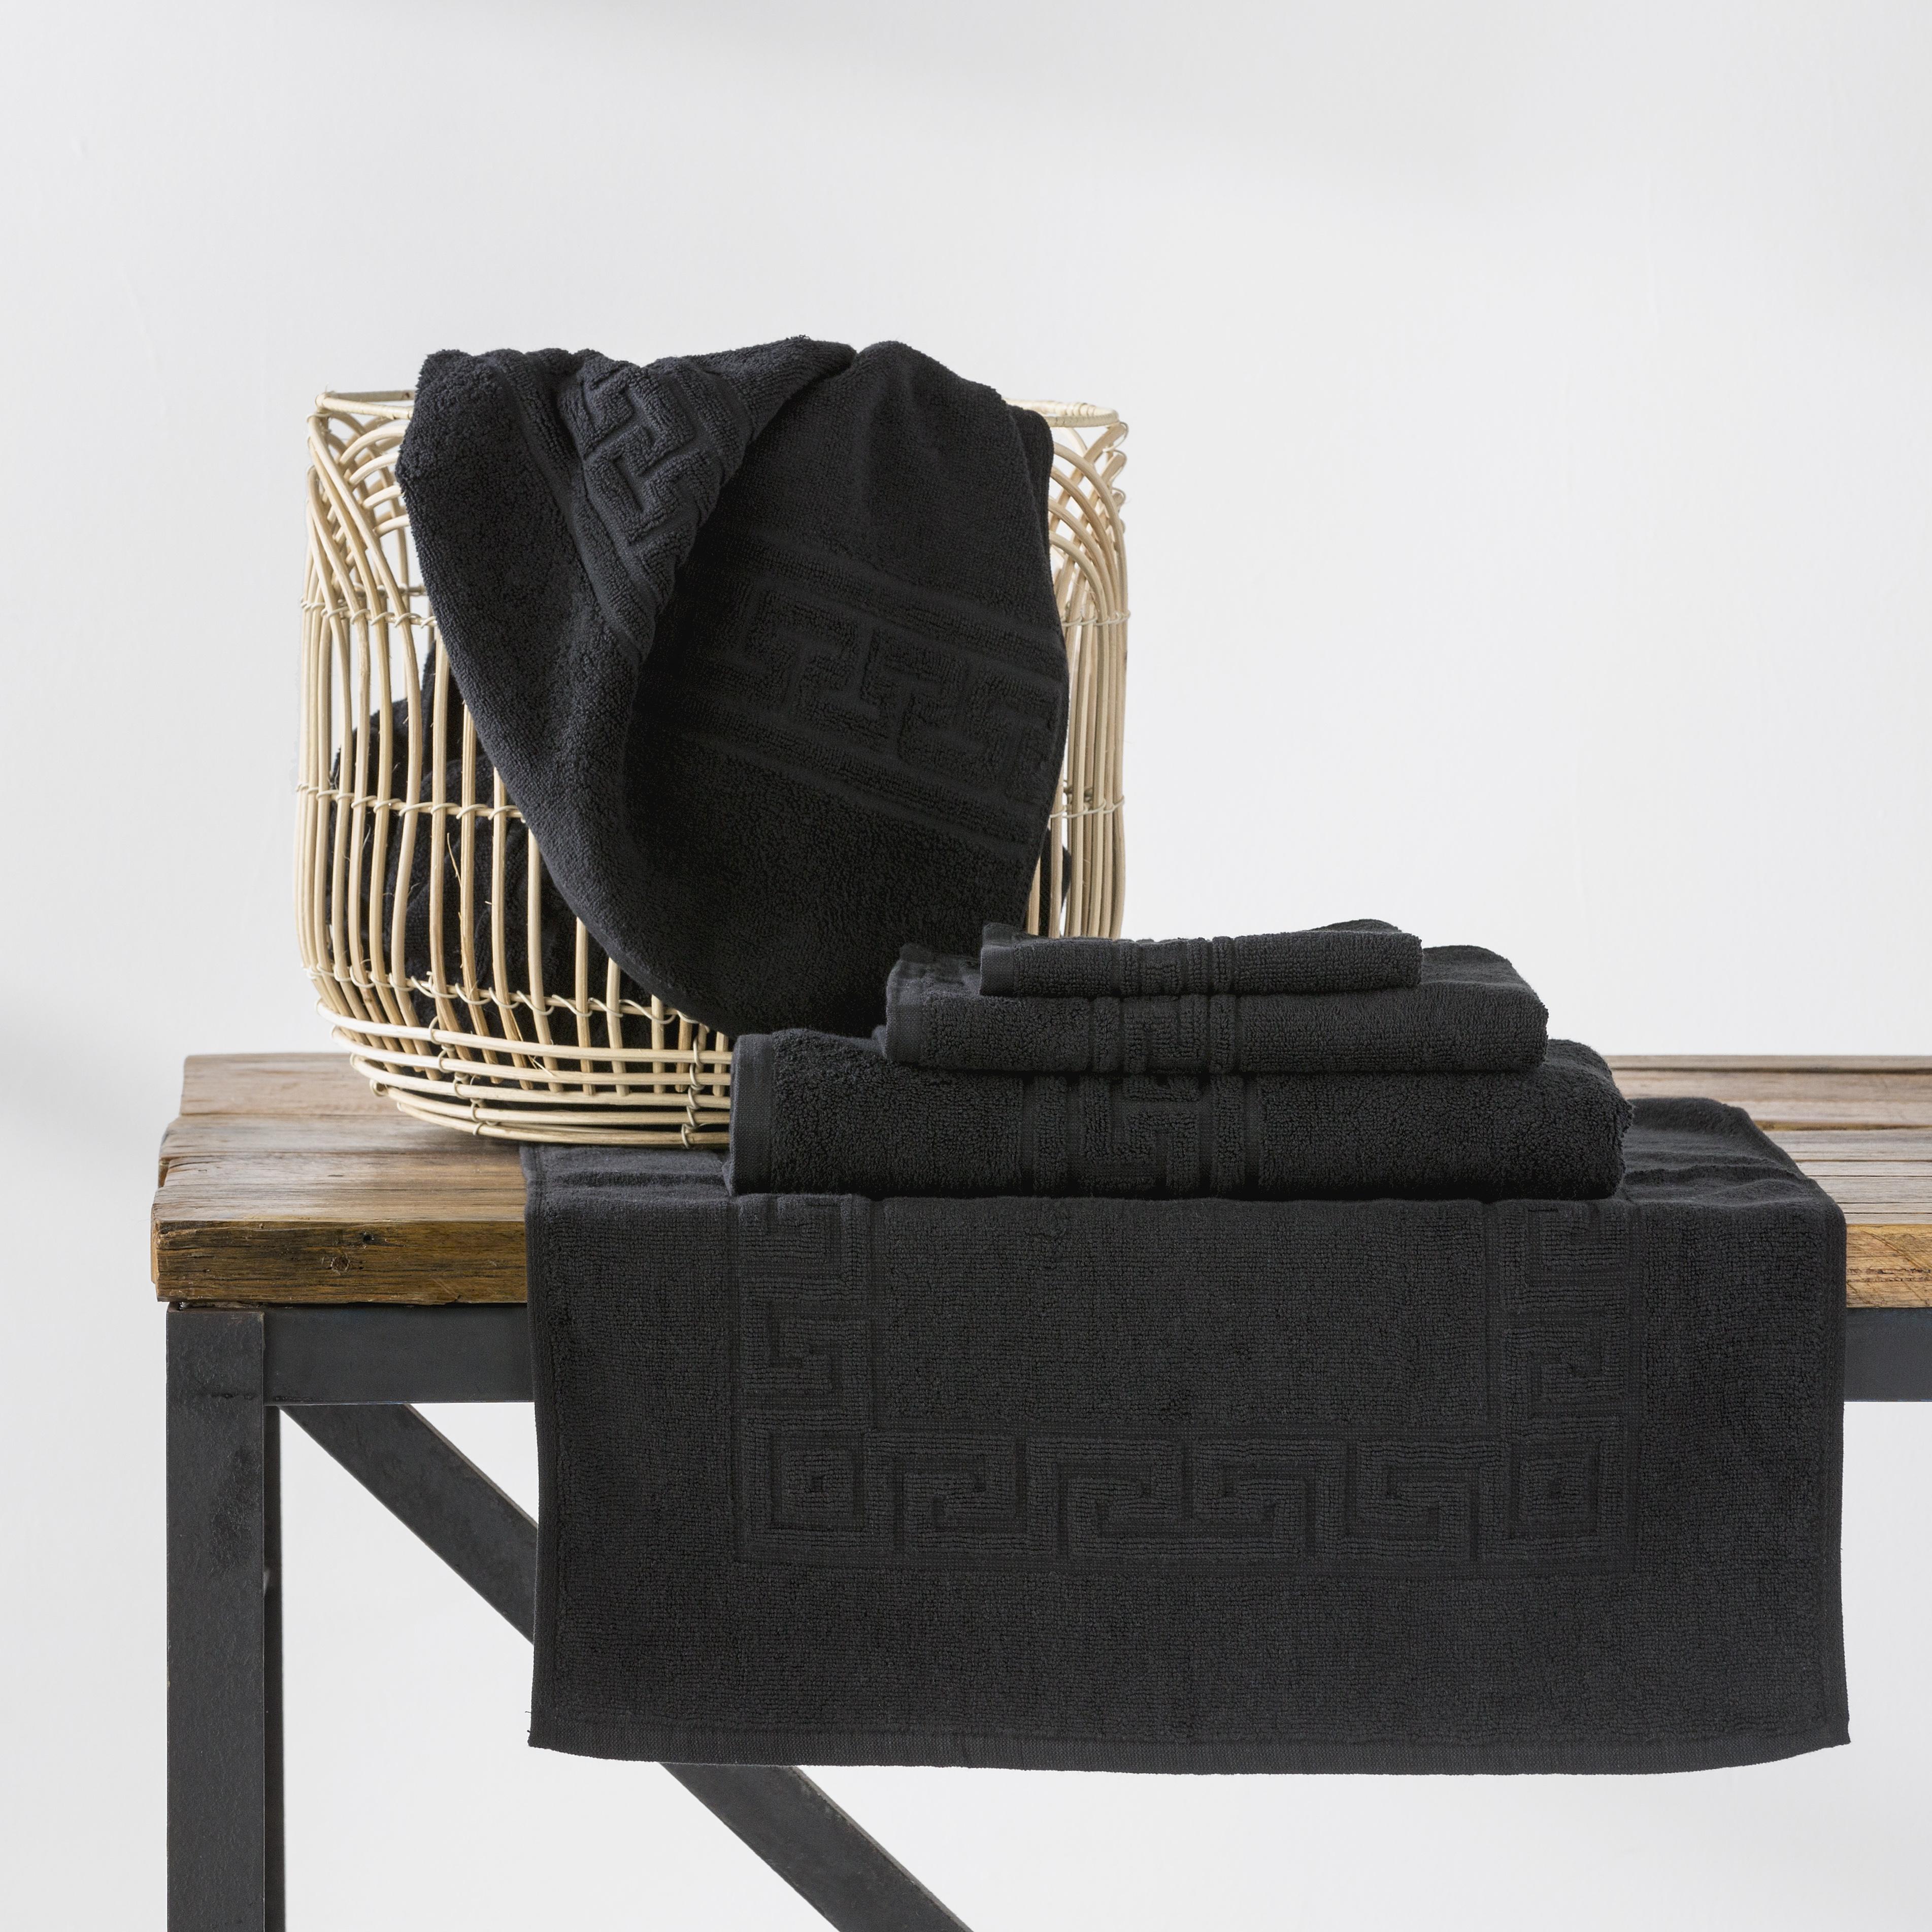 Greek Key Hotel Quality 100% Cotton Towels | Black